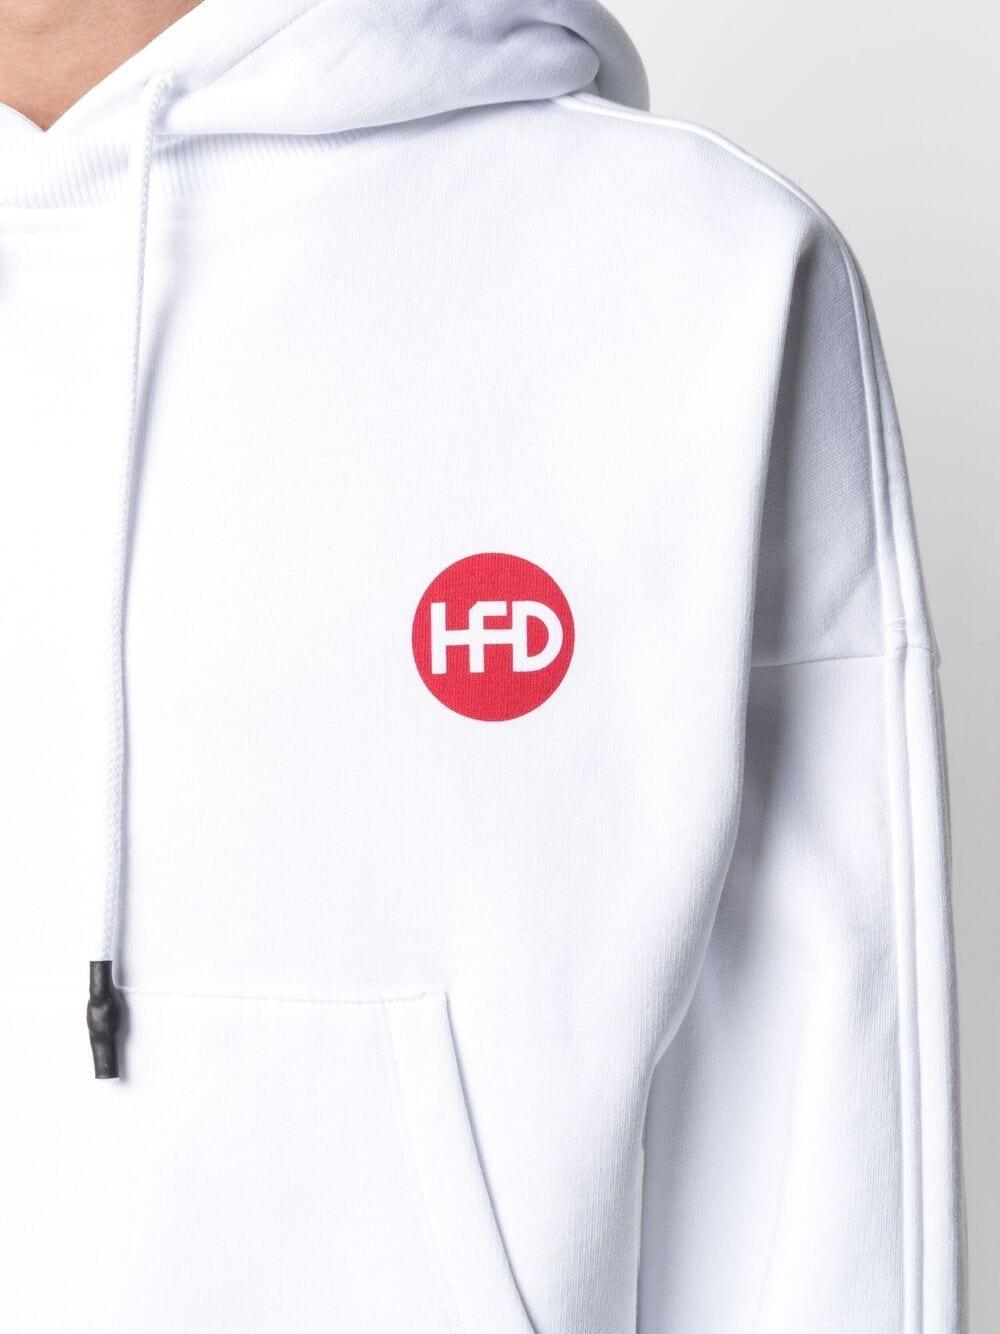 Felpa unisex con stampa logo e cappuccio con coulisse HONEY FUCKING DIJON | Felpa | HFD03T0223